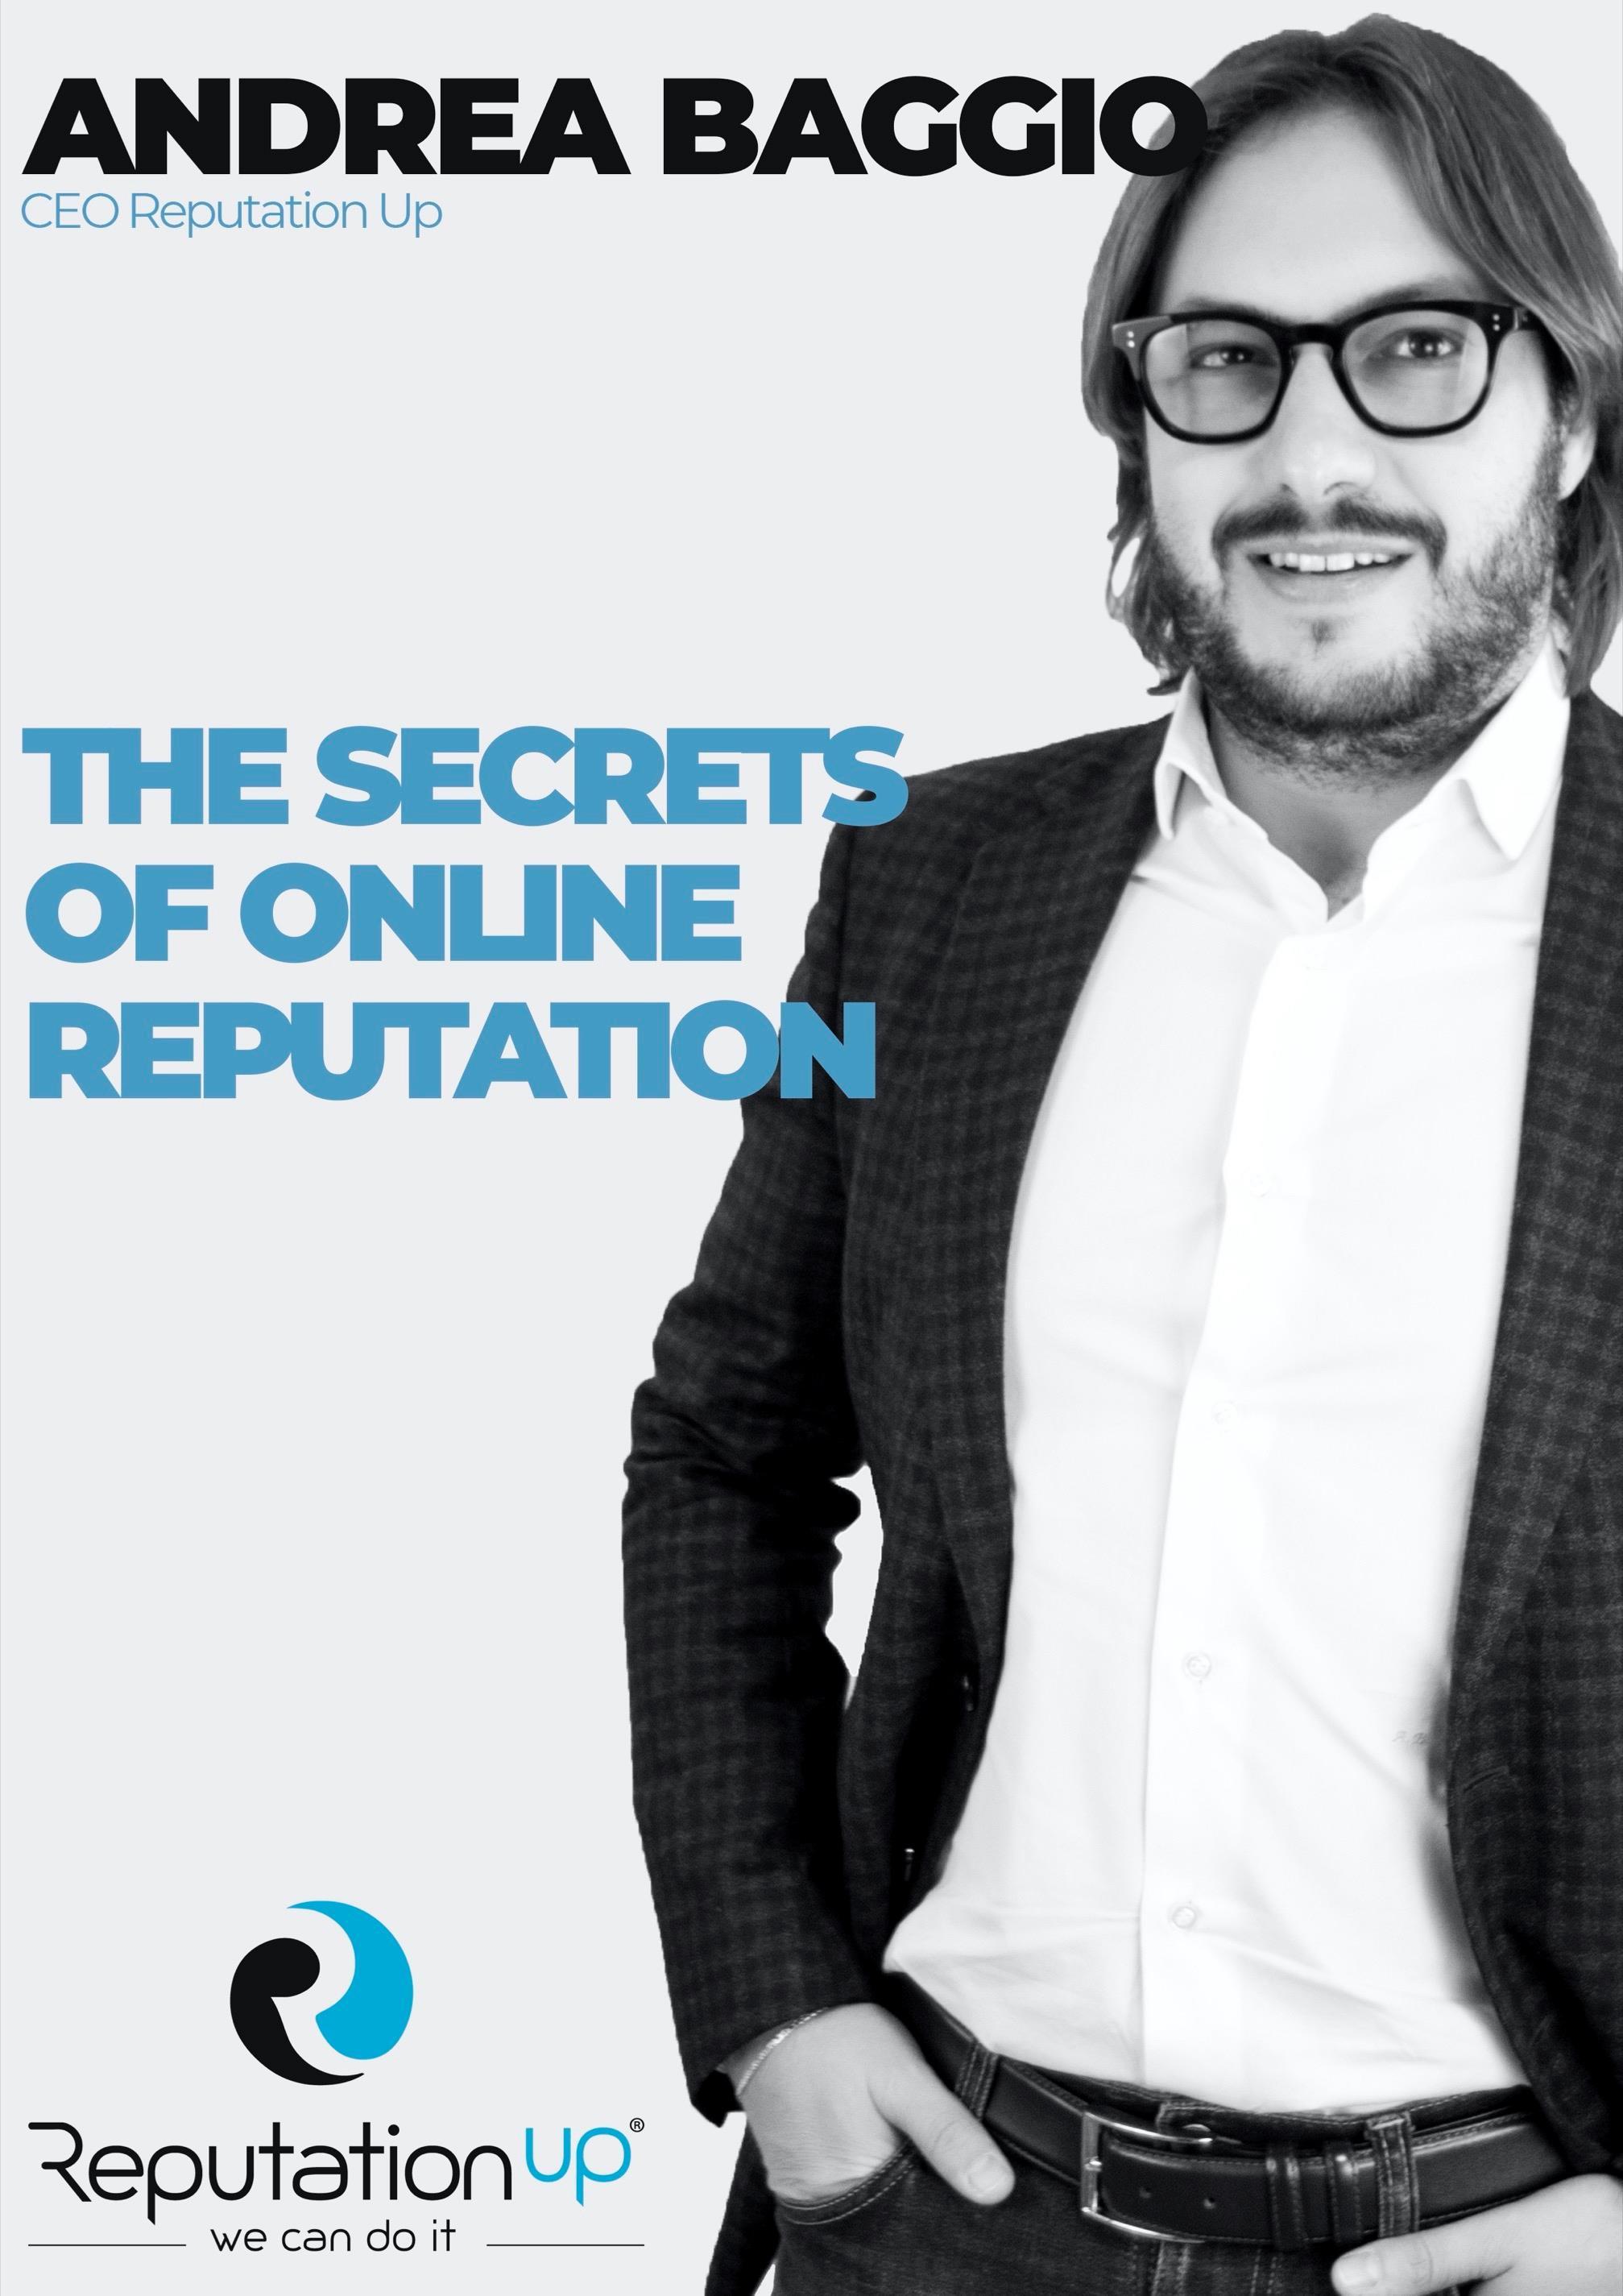 Andrea Baggio CEO ReputationUP The Secrets of Online Reputation